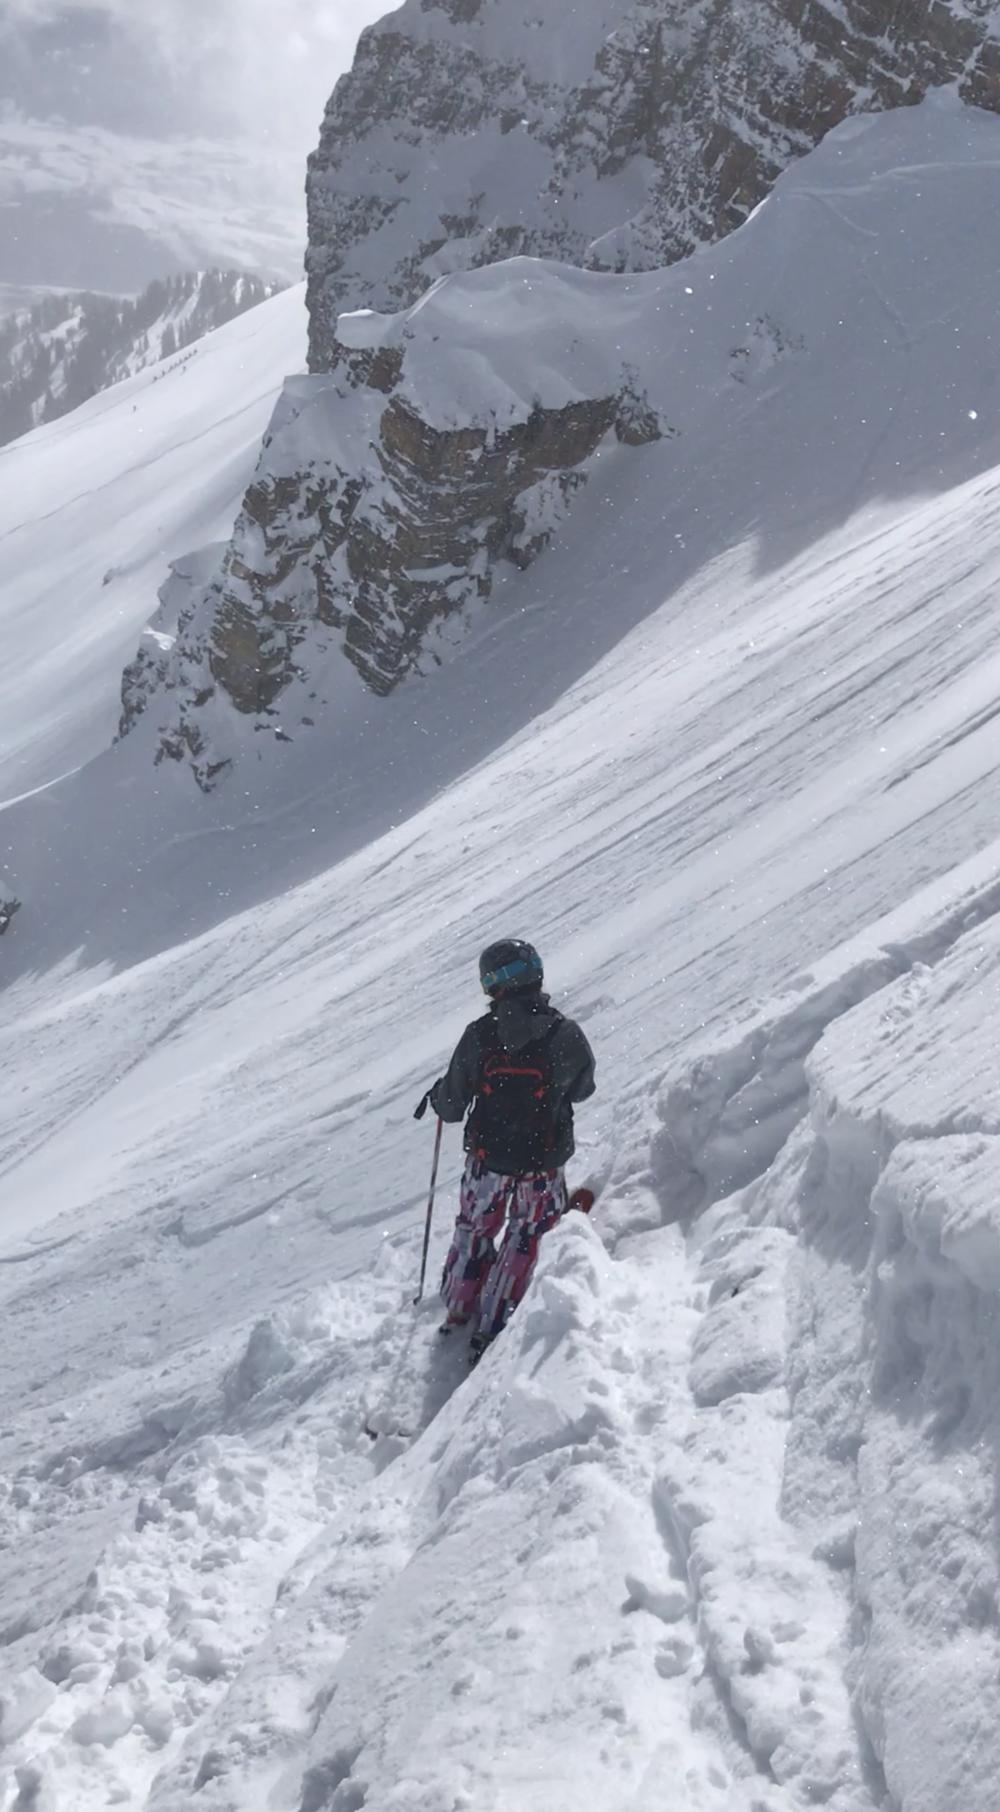 skiing no shadows Jackson hole